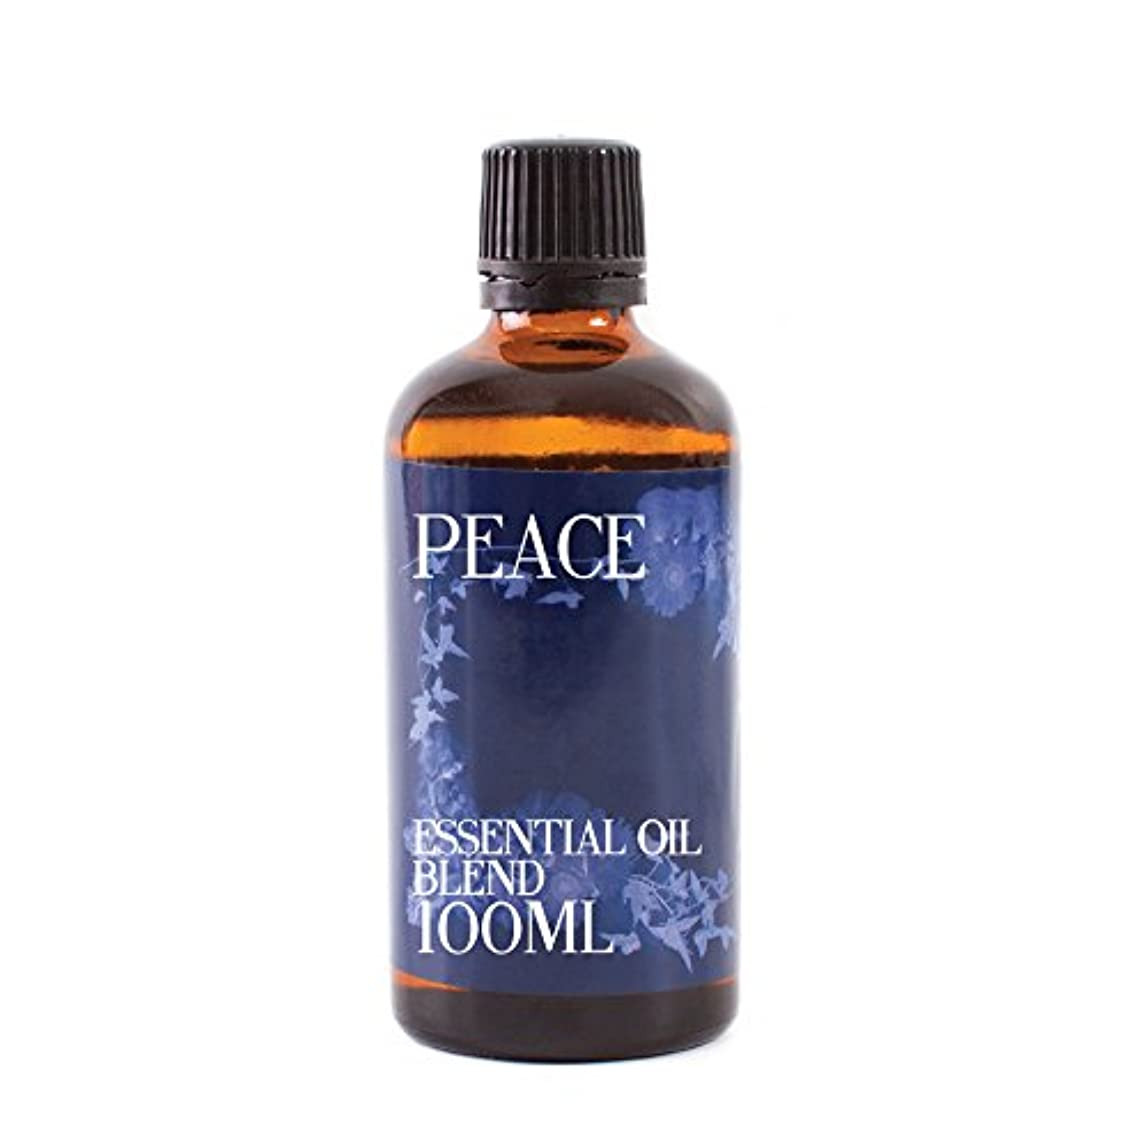 狼憂鬱削減Mystic Moments | Peace Essential Oil Blend - 100ml - 100% Pure